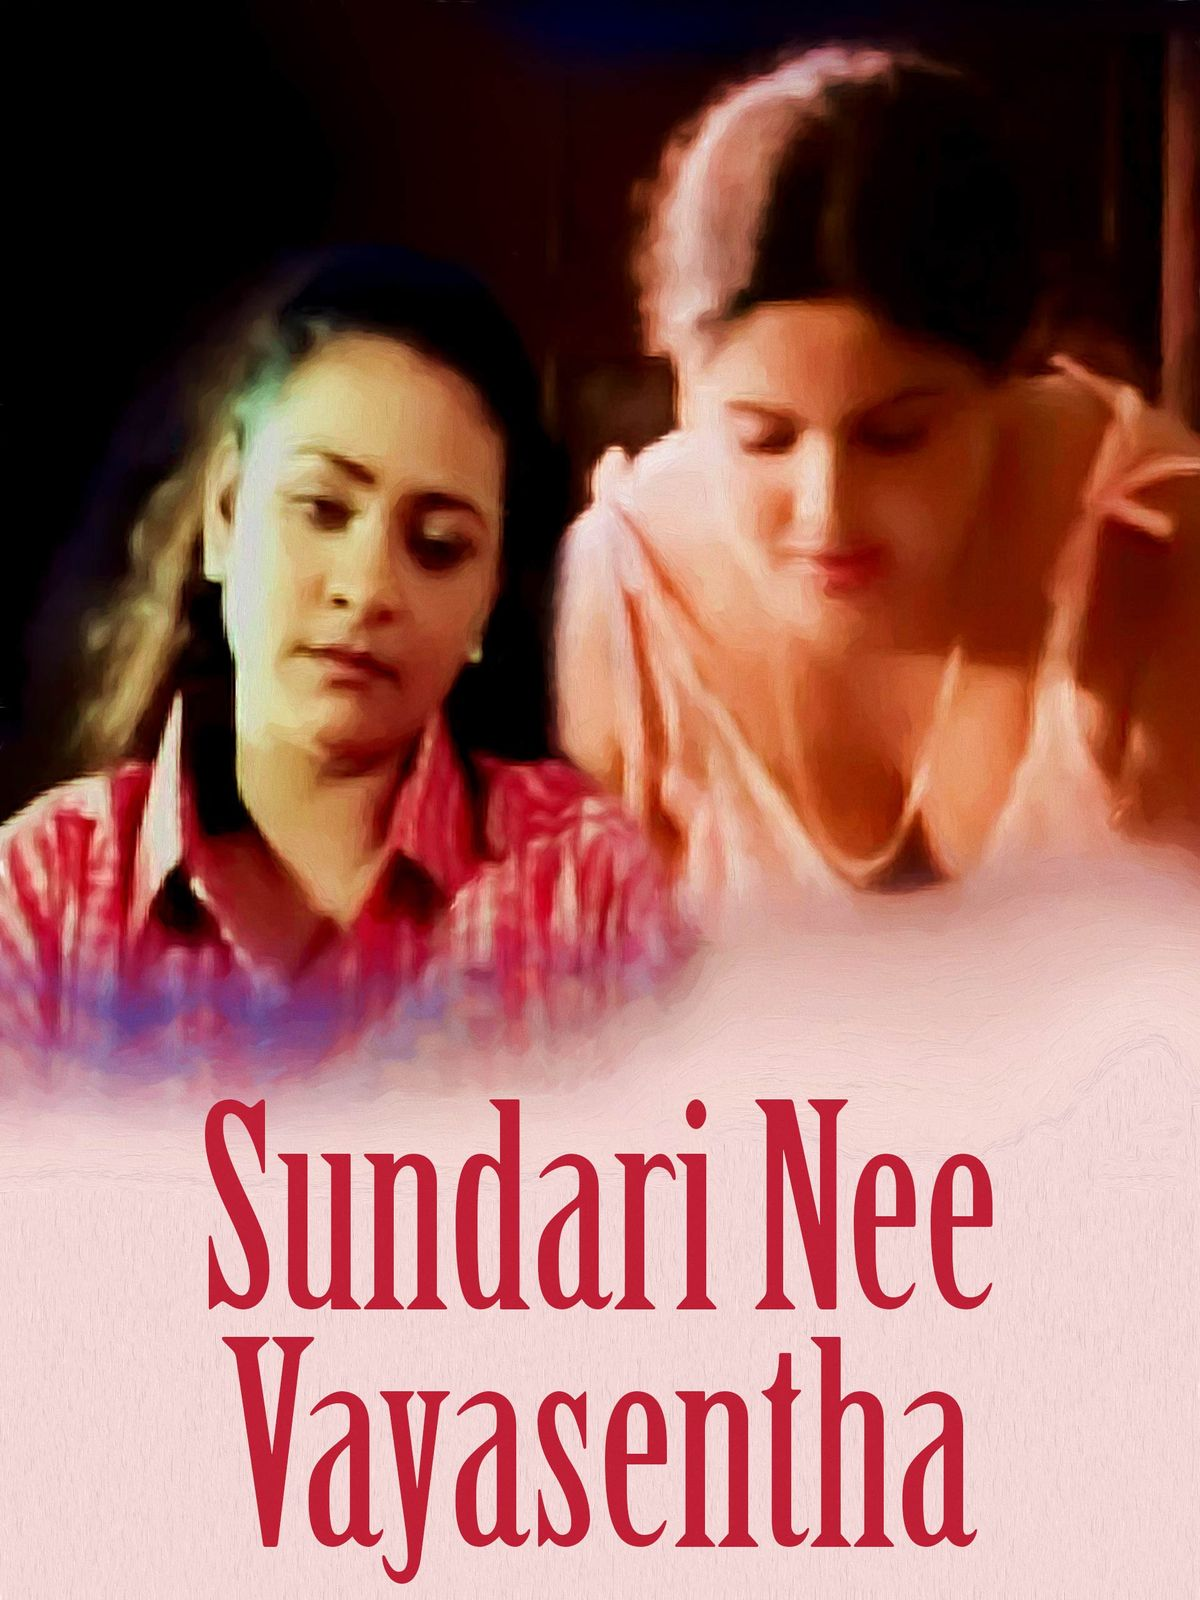 Sundari Nee Vayasentha